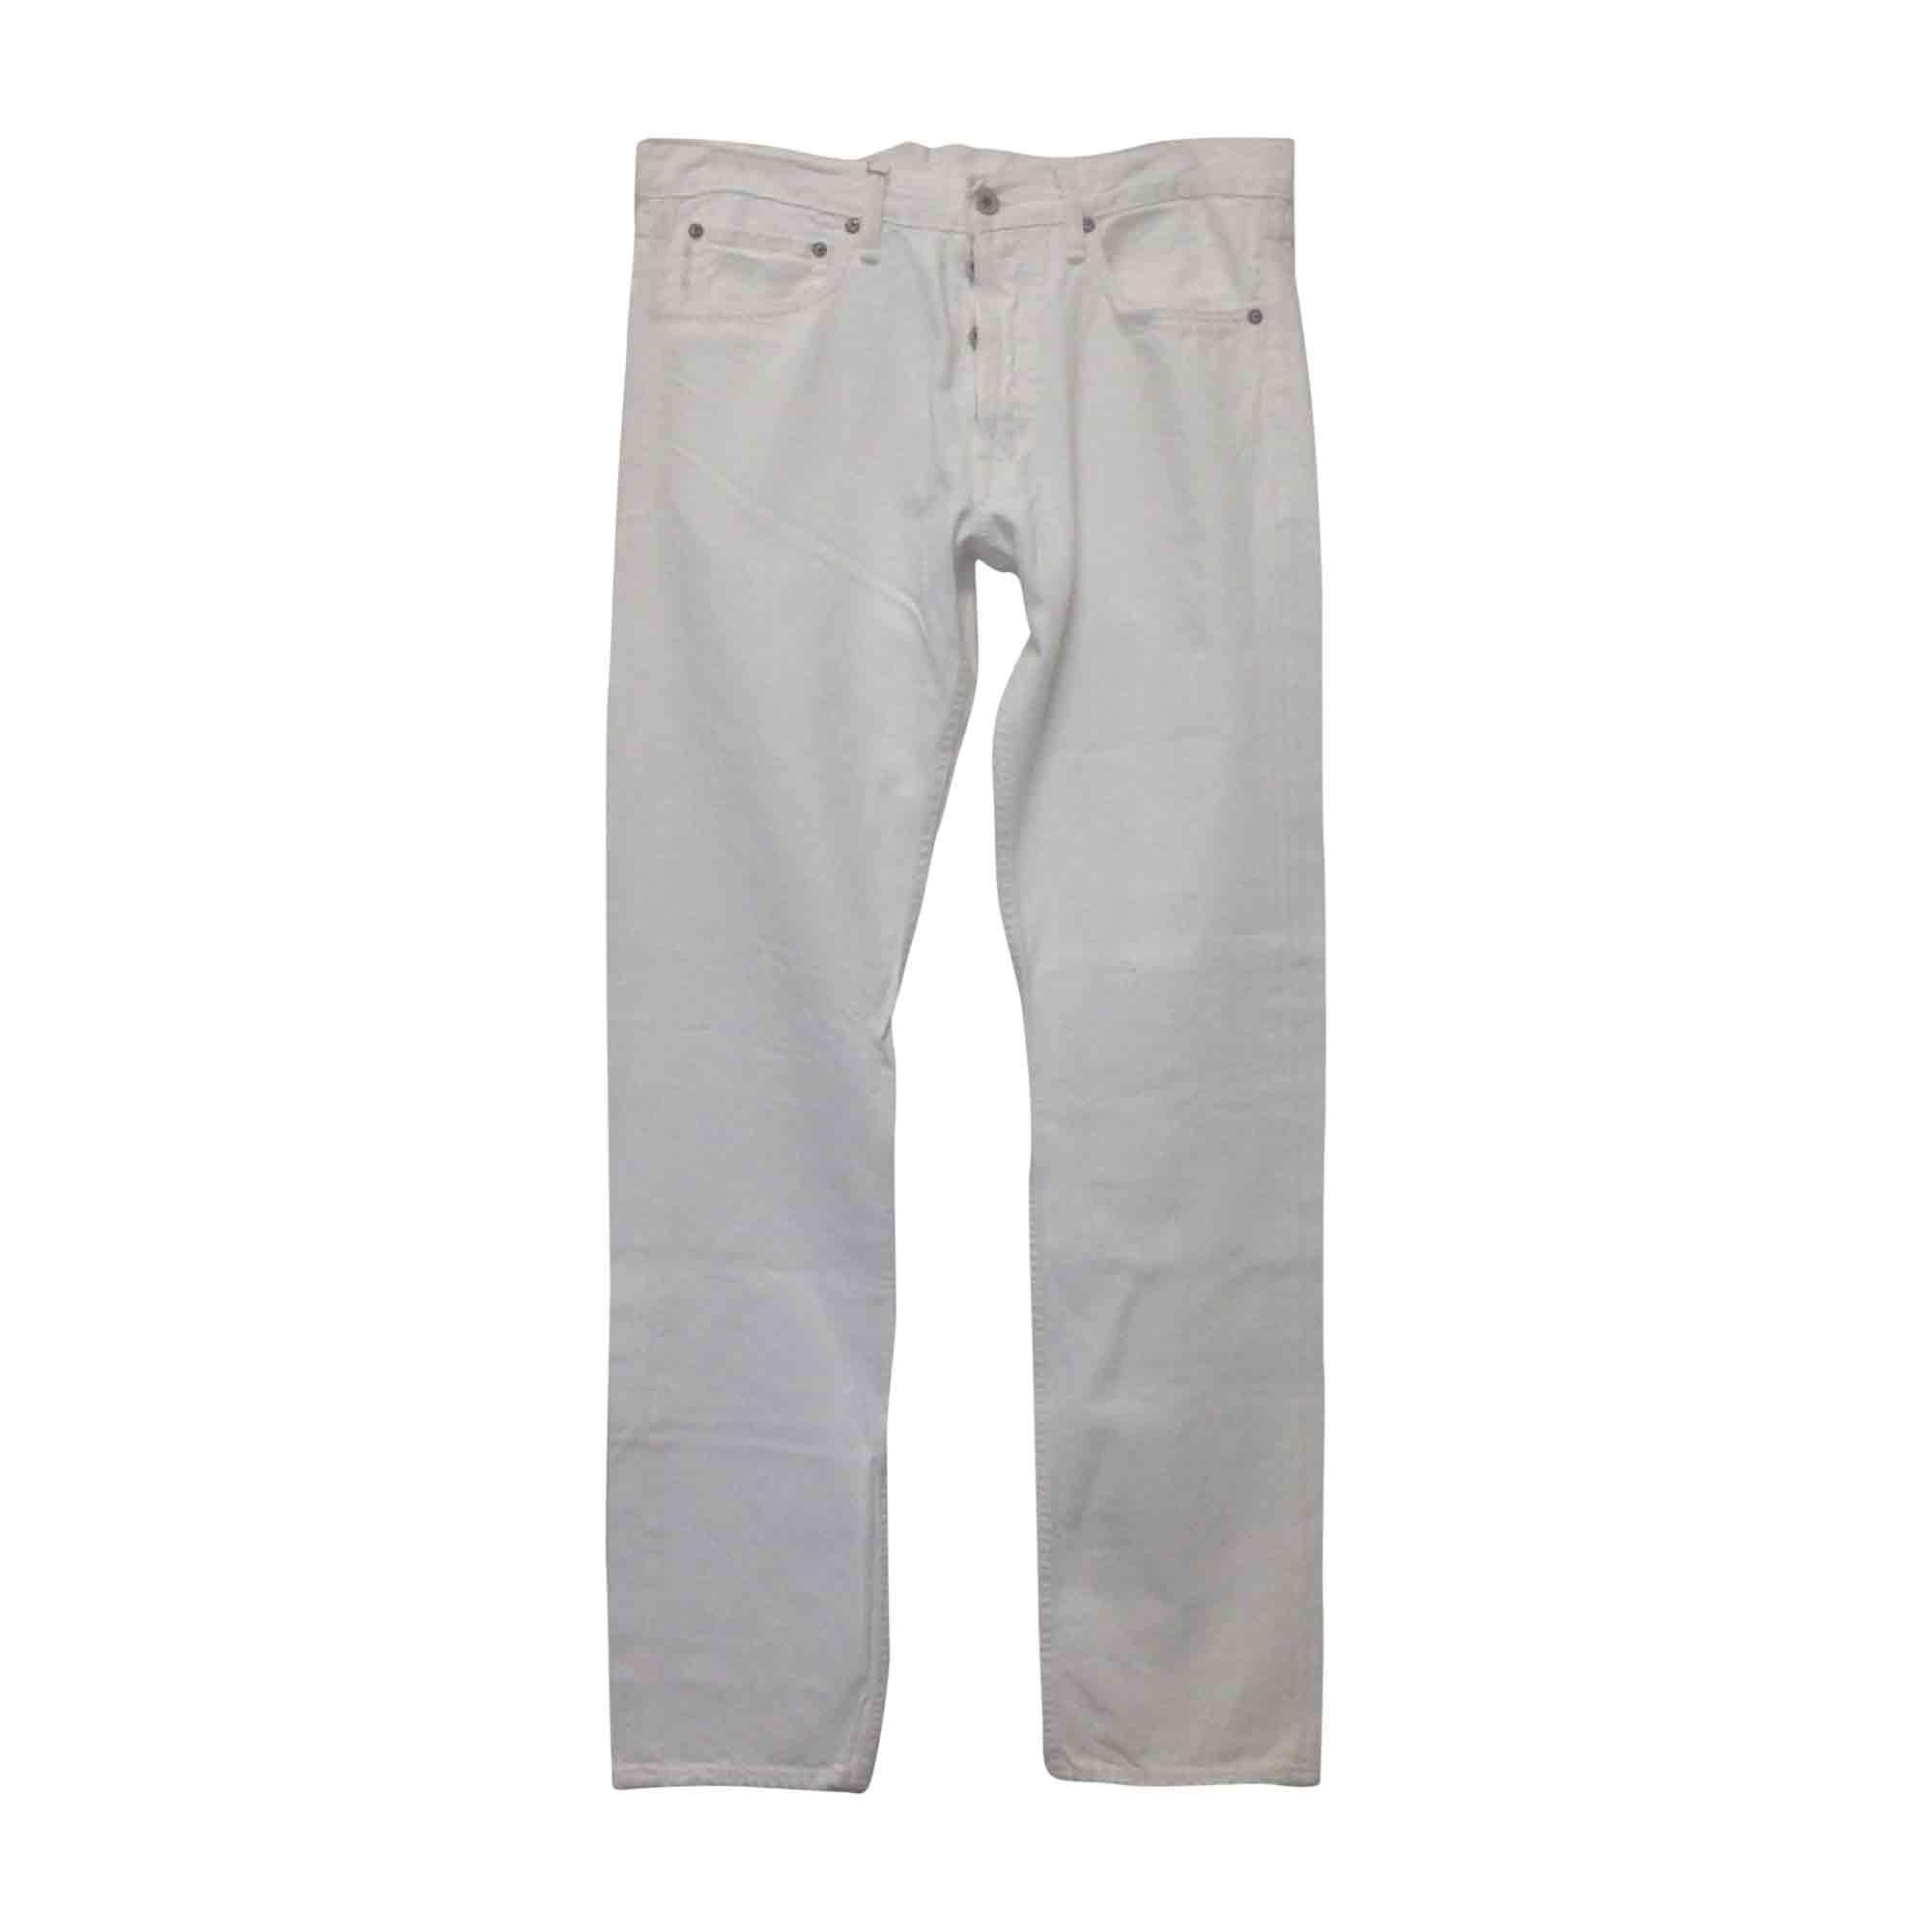 Pantalon slim RALPH LAUREN Blanc, blanc cassé, écru